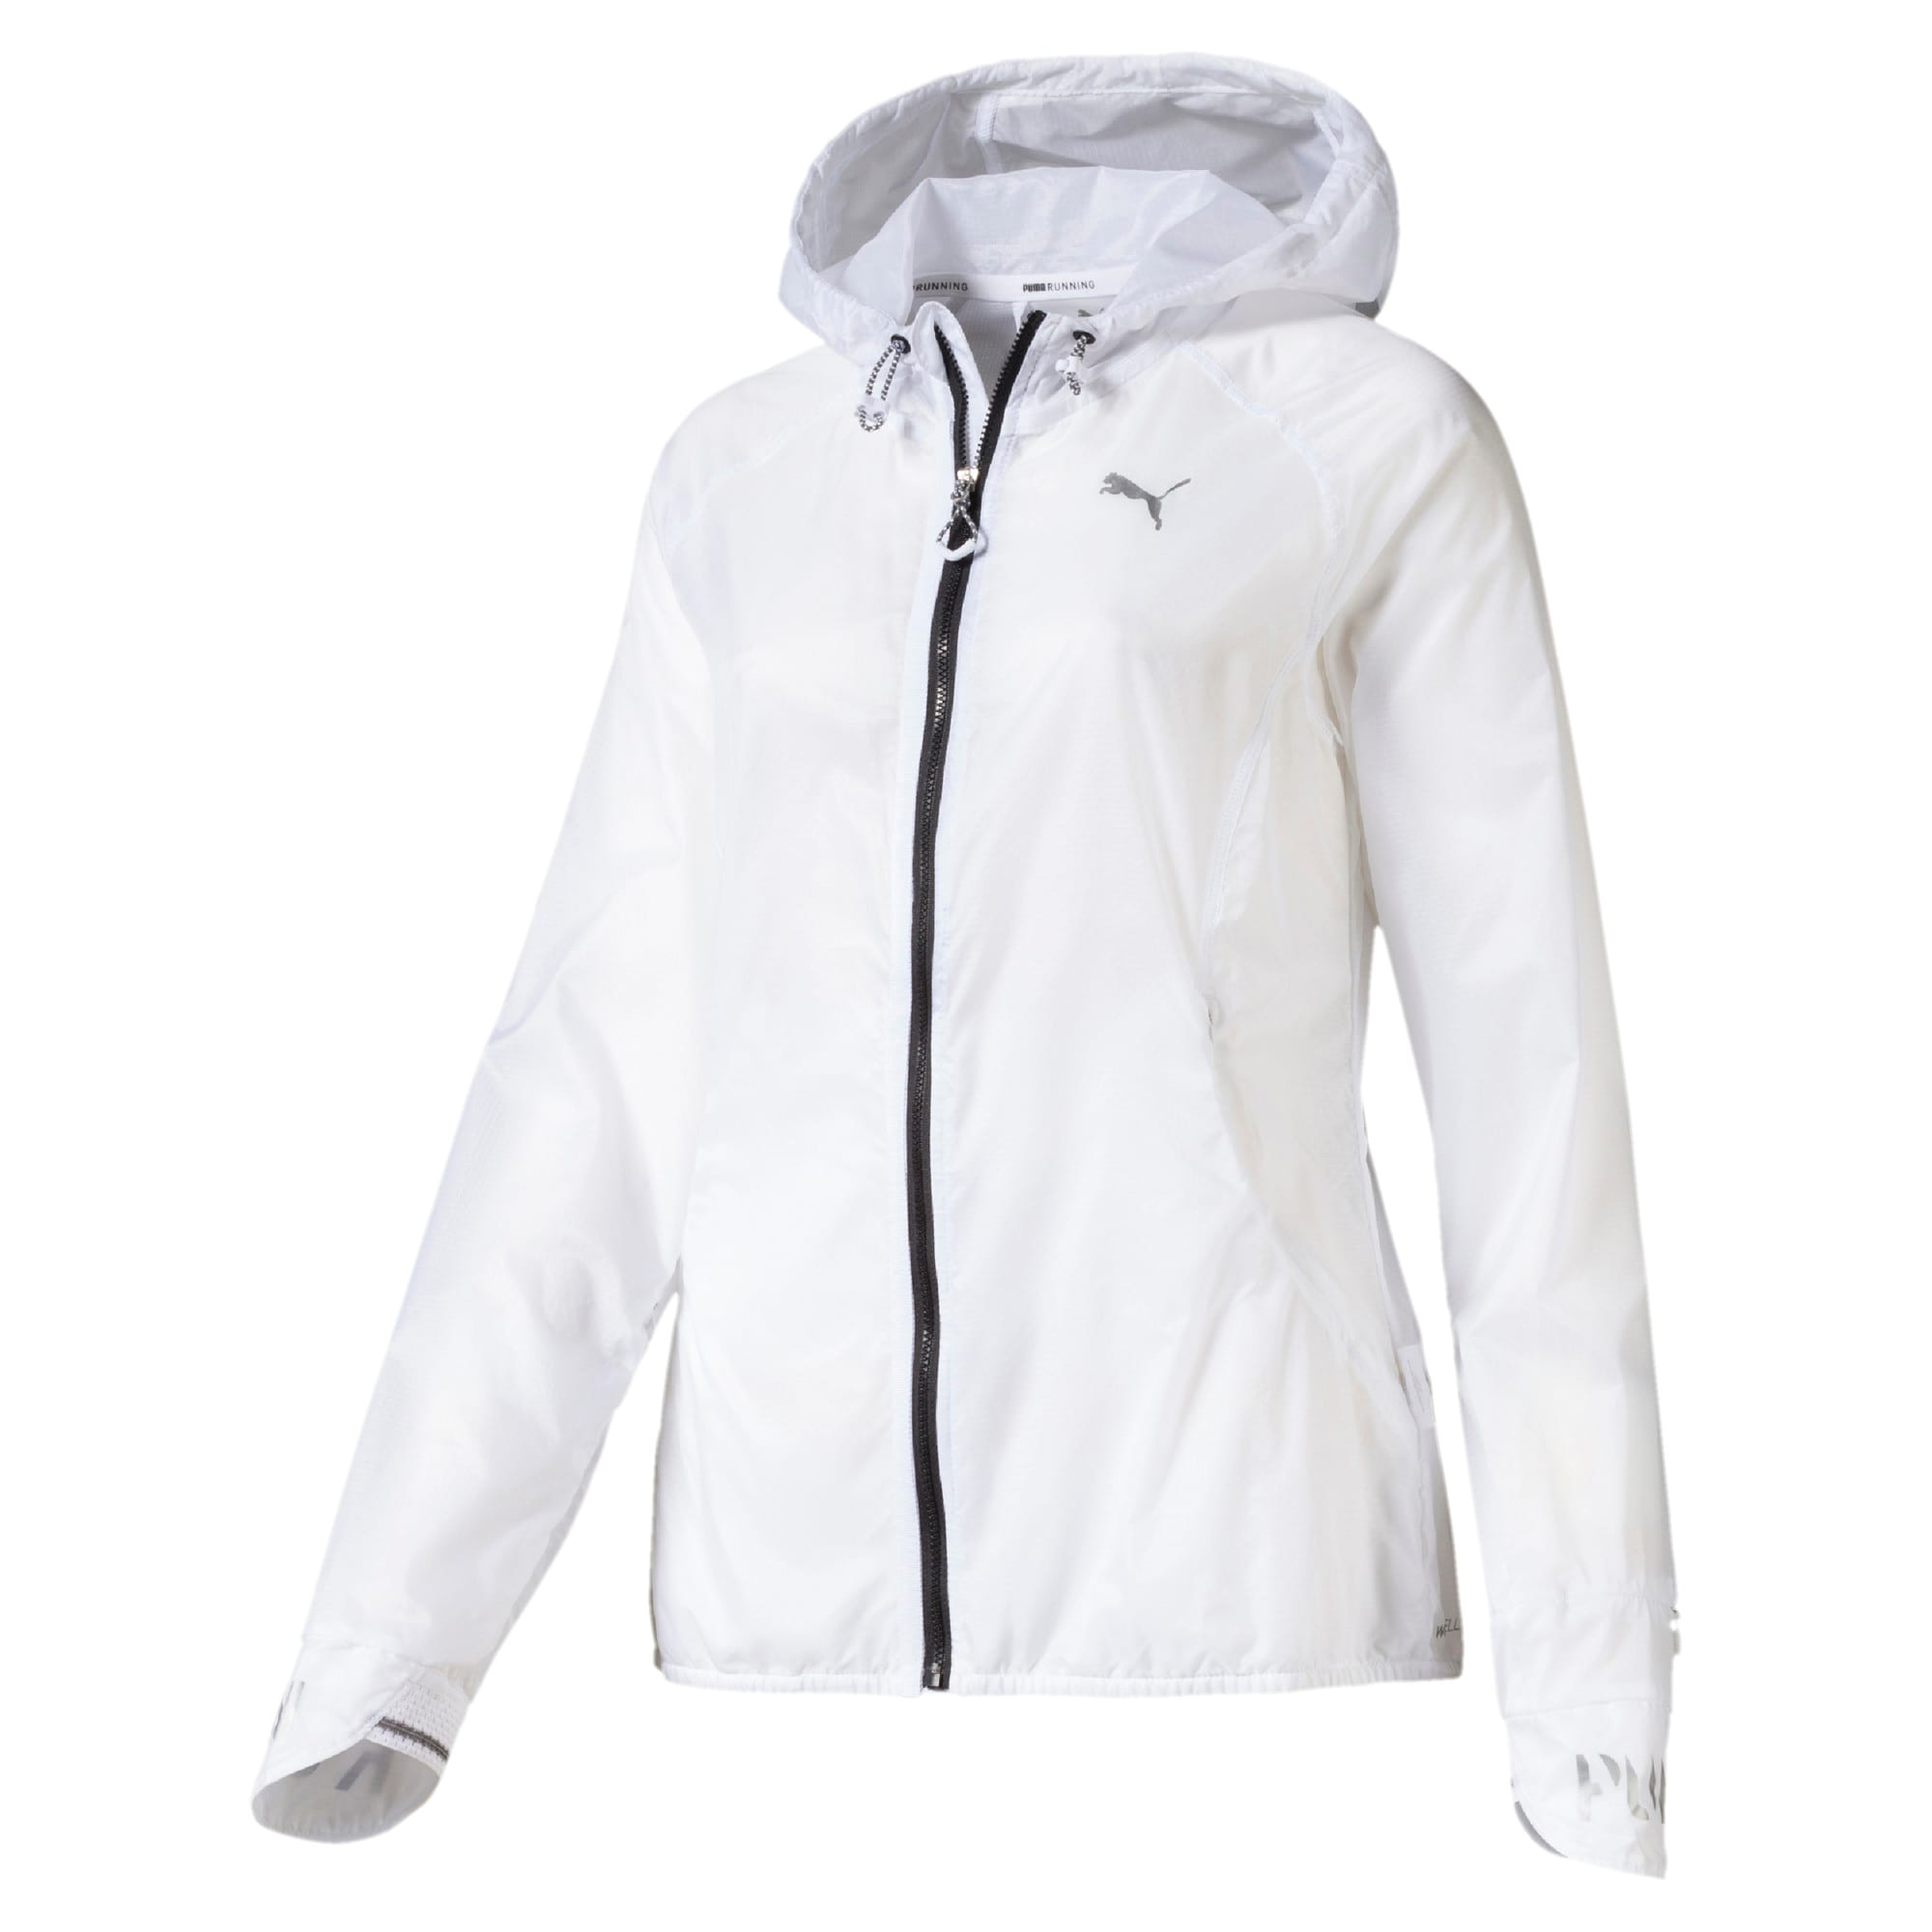 Thumbnail 4 of Get Fast Hooded Full Zip Women's Running Jacket, Puma White, medium